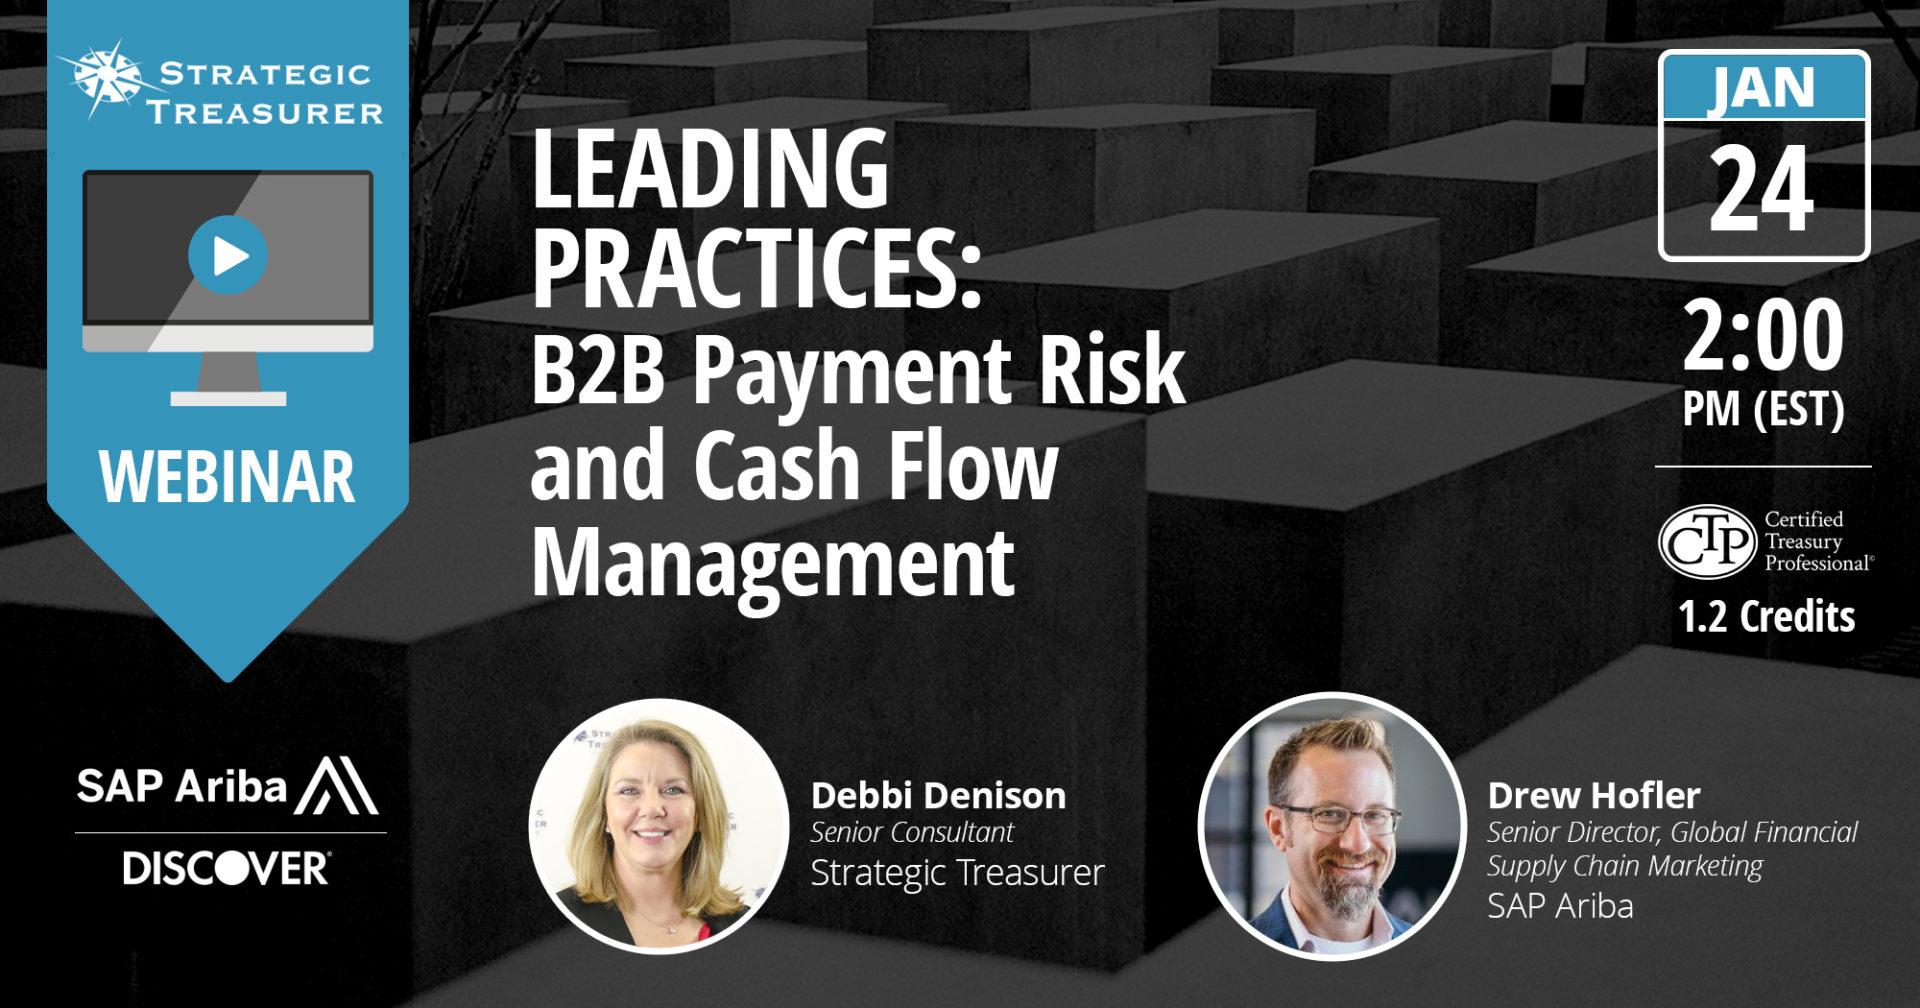 Leading Practices: B2B Payment Risk and Cash Flow Management Webinar